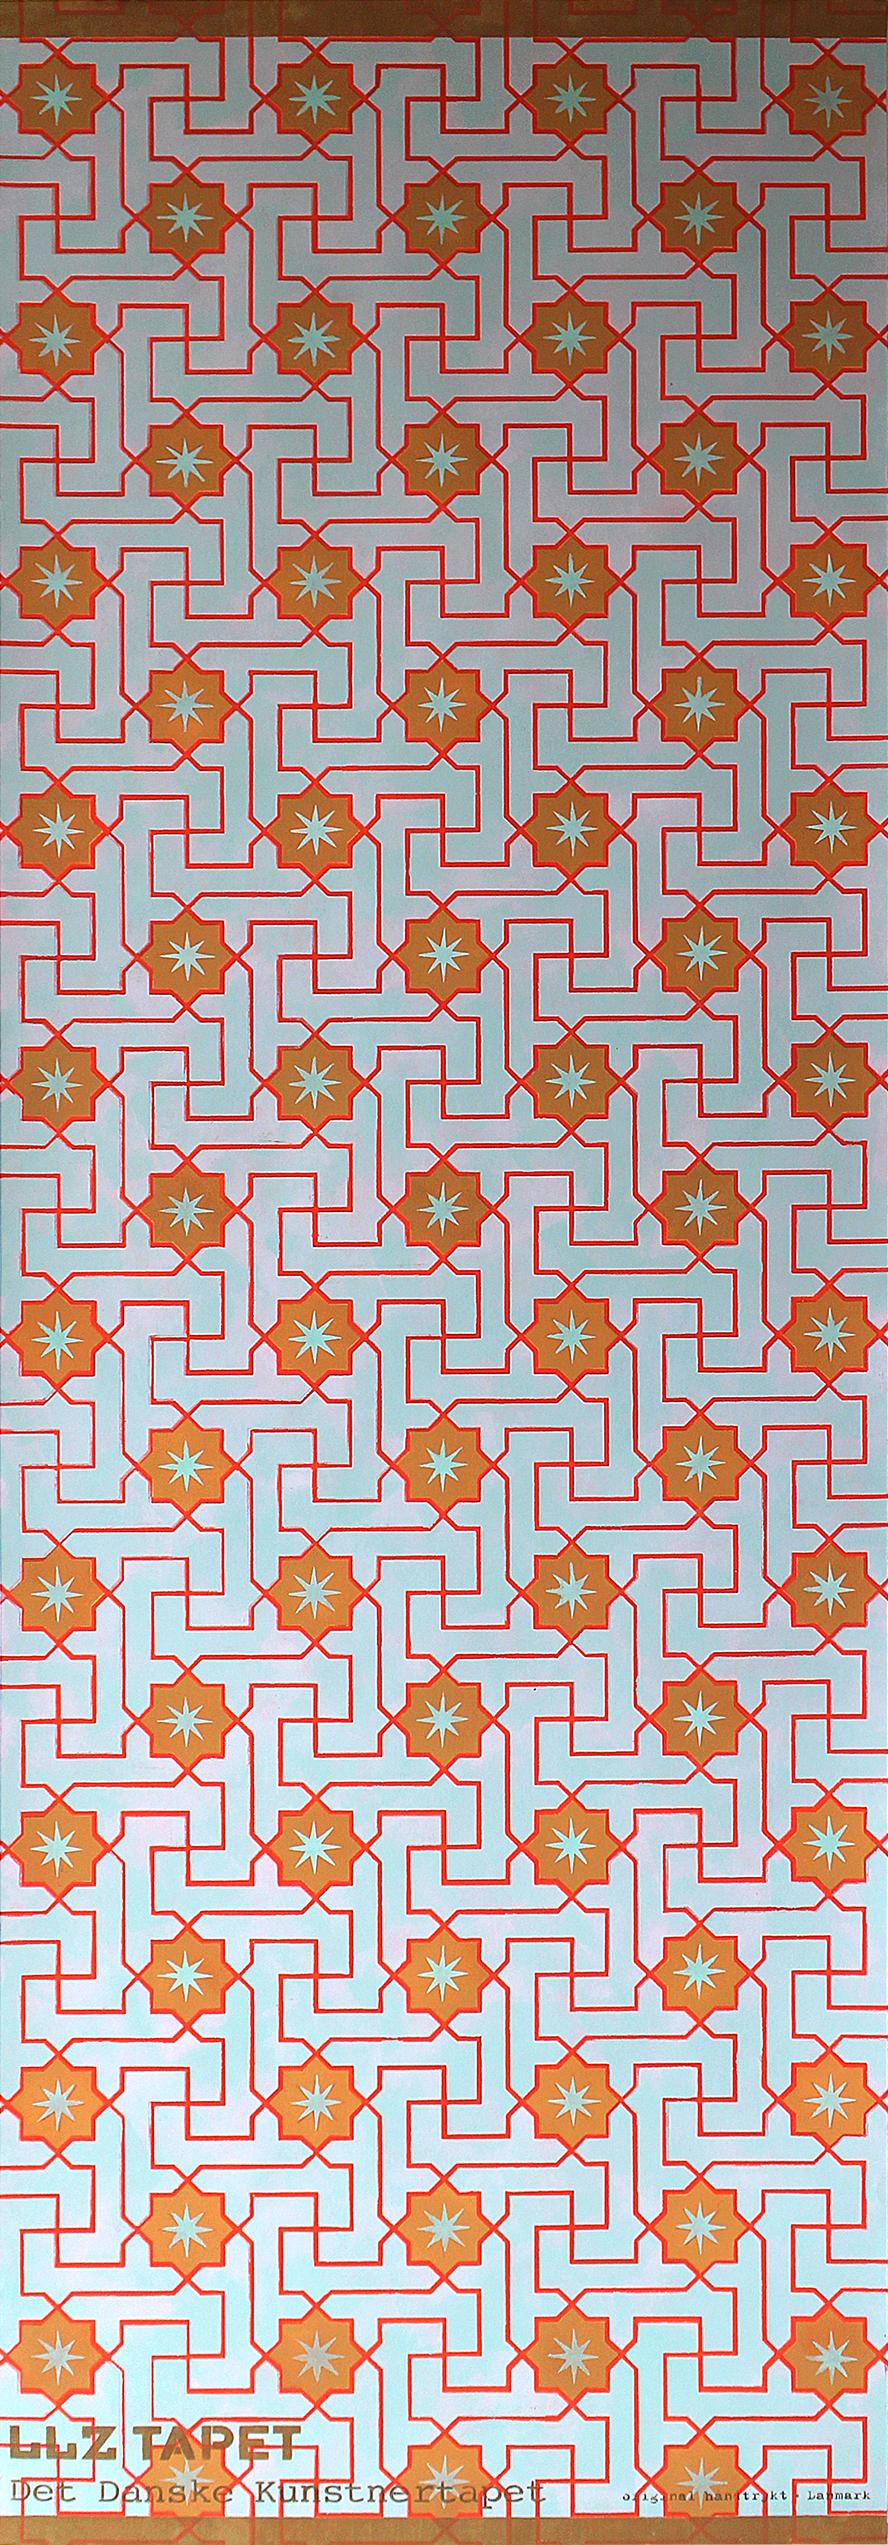 Willumsen og Alhambramønstret 21. Original håndtrykt på nonwoven 140 g´ tapetpapir med kompositionsfarver. Måler 56 x 166 cm. Prisen er 1.700,-